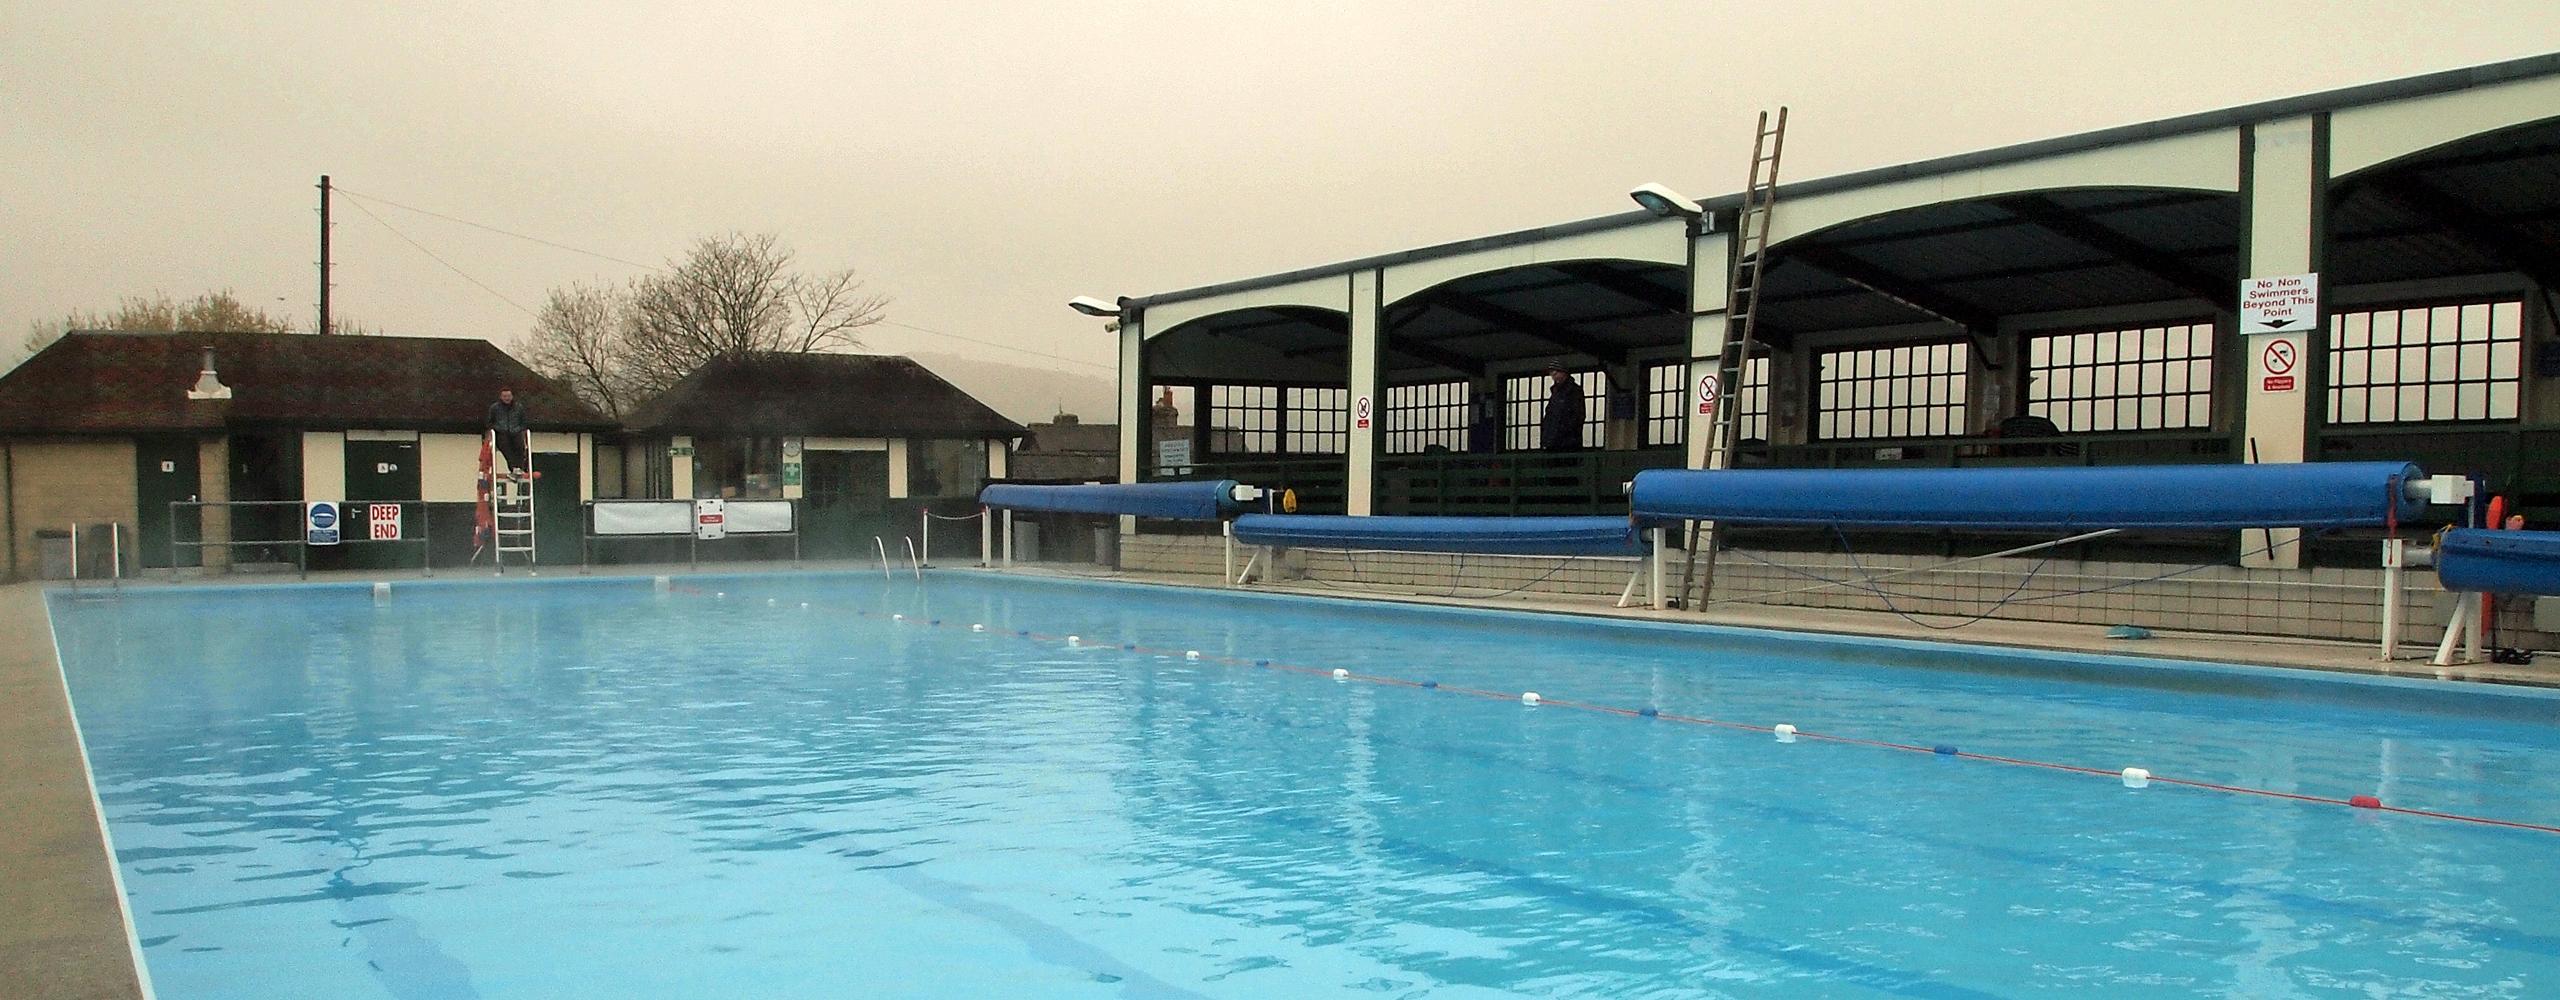 River swimming waterlog reswum page 3 - Hathersage open air swimming pool ...